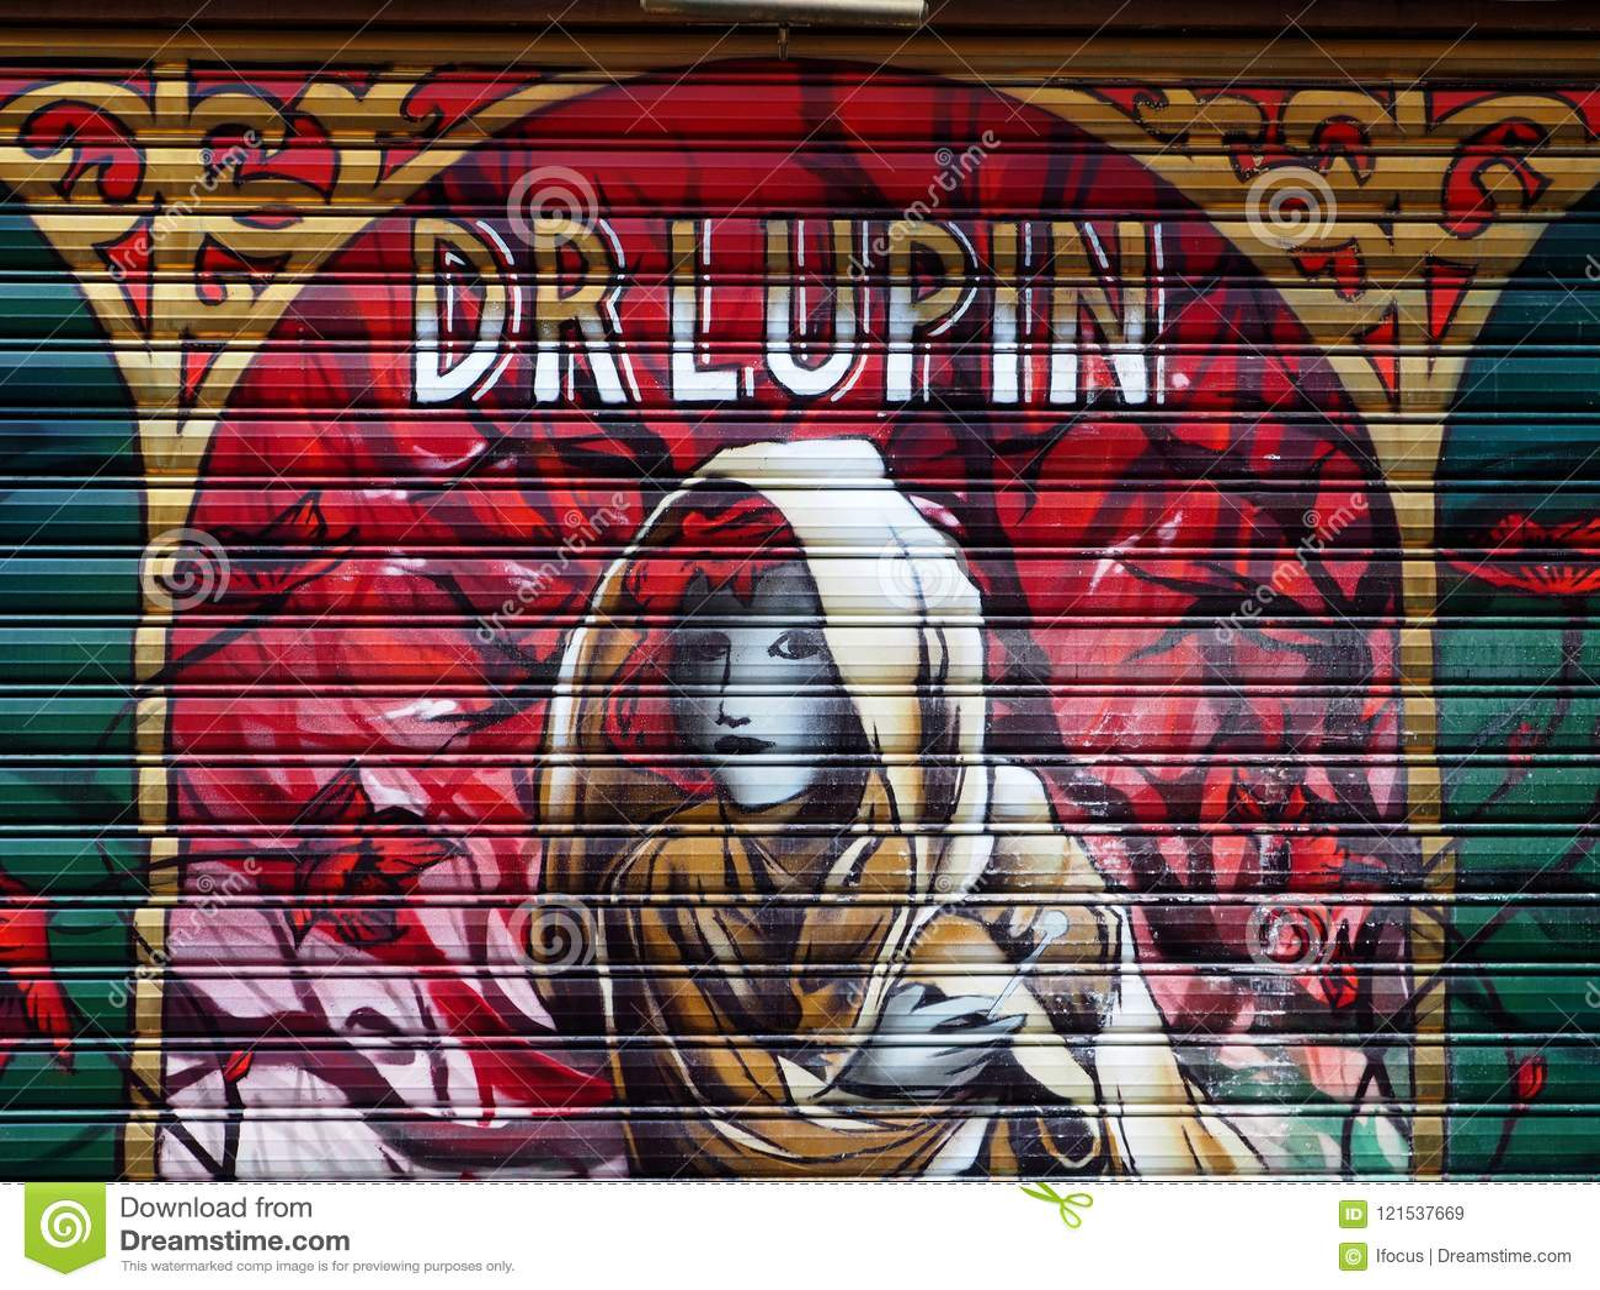 Graffiti Covering A Bars Roller Shutters In Paris